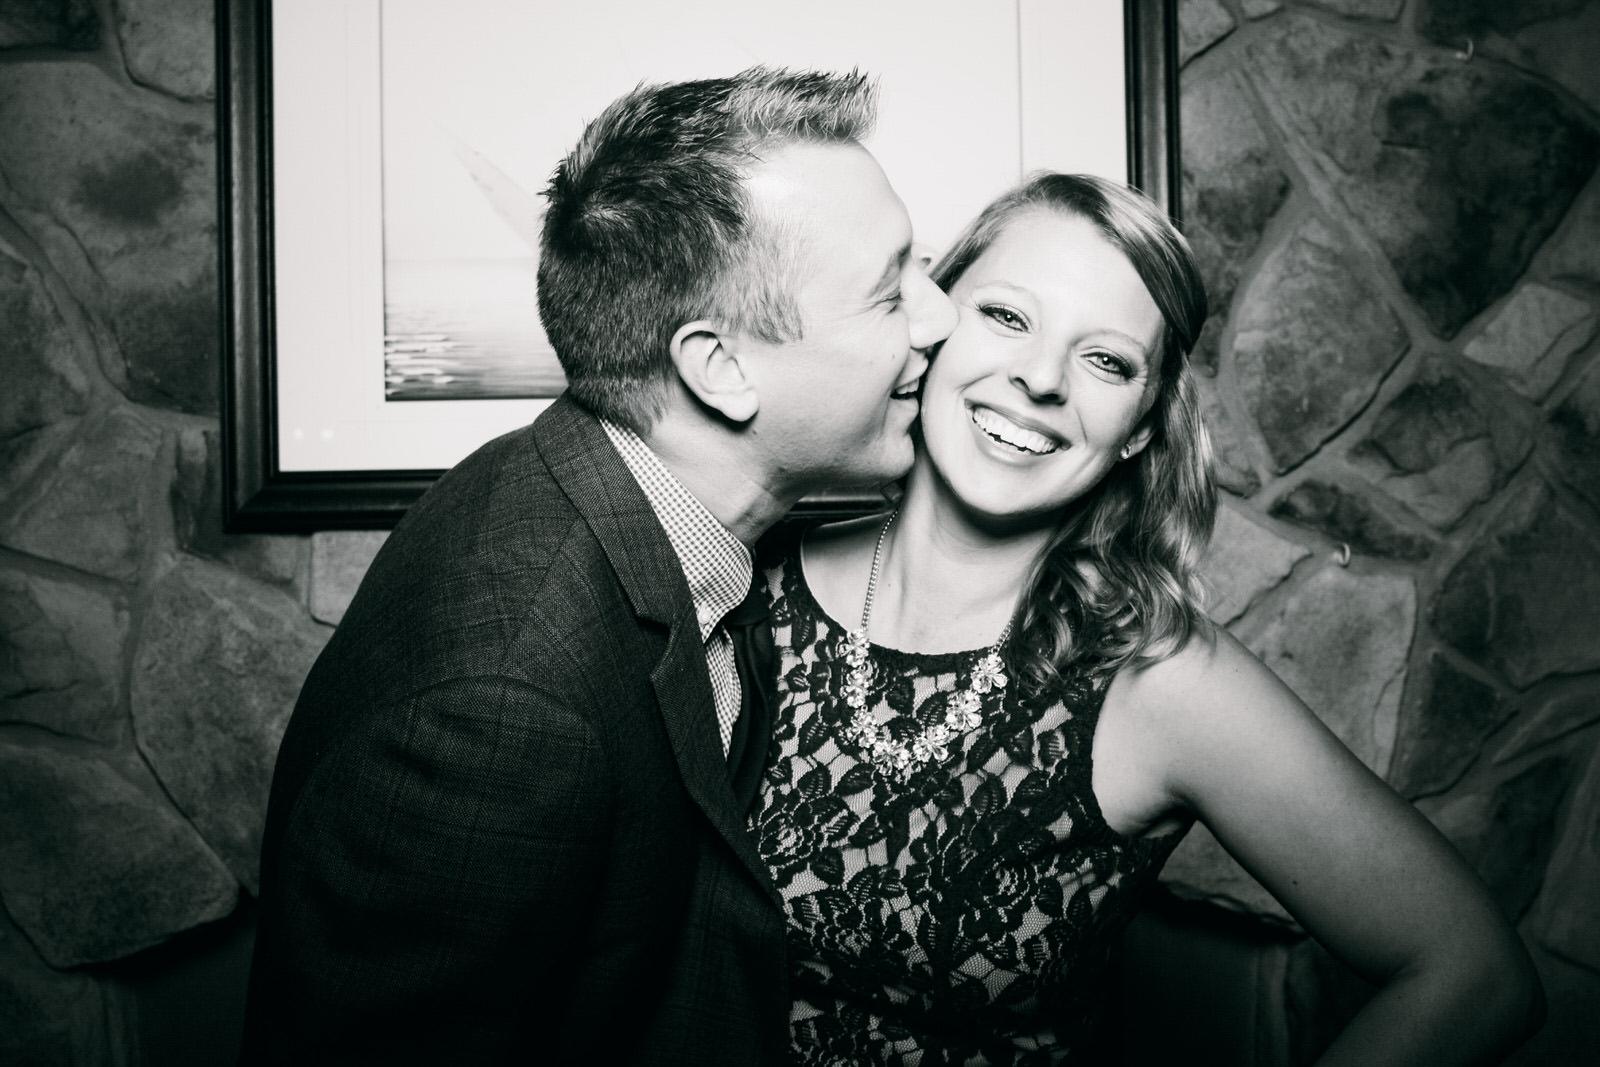 Jeanine-Sean-Wedding-Photo-Booth-2.jpg